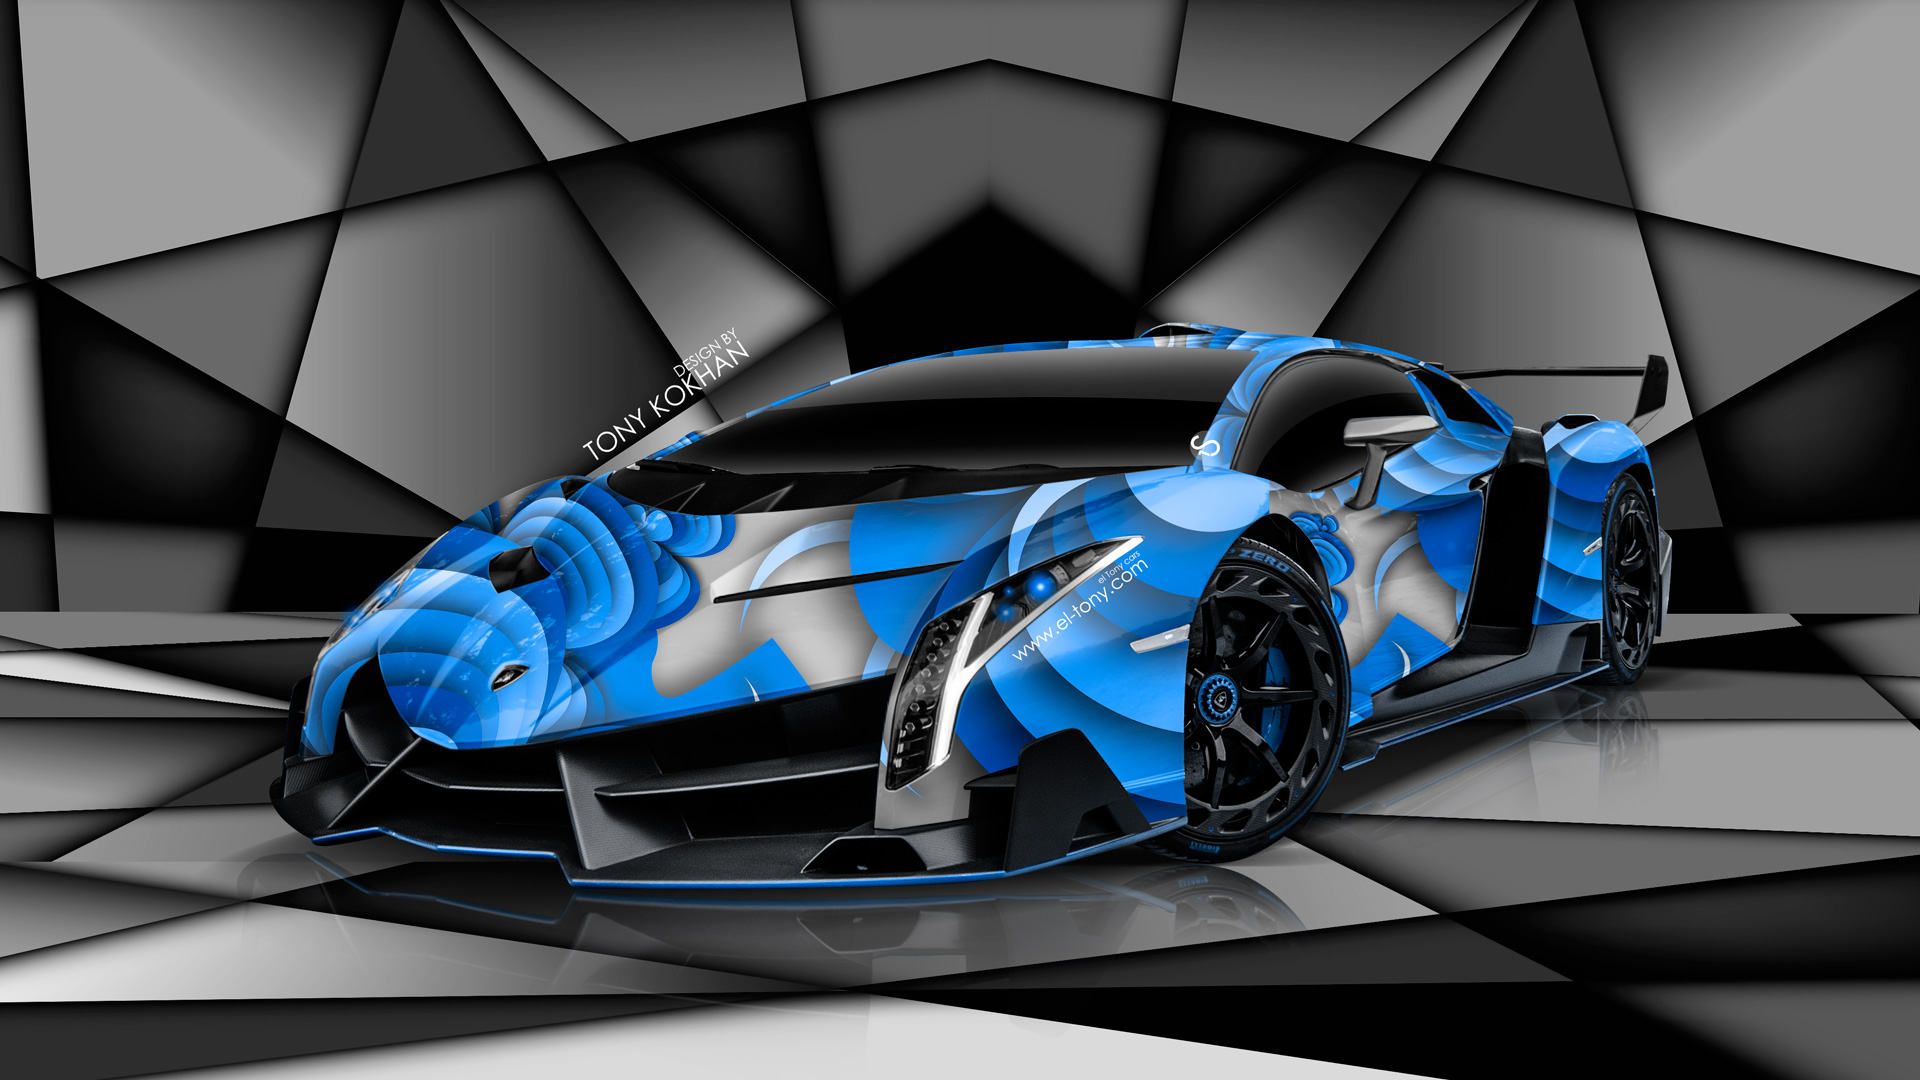 Black And Blue Lamborghini Wallpaper 14 Free Wallpaper Lamborghini Veneno Wallpaper Blue 1920x1080 Wallpaper Teahub Io